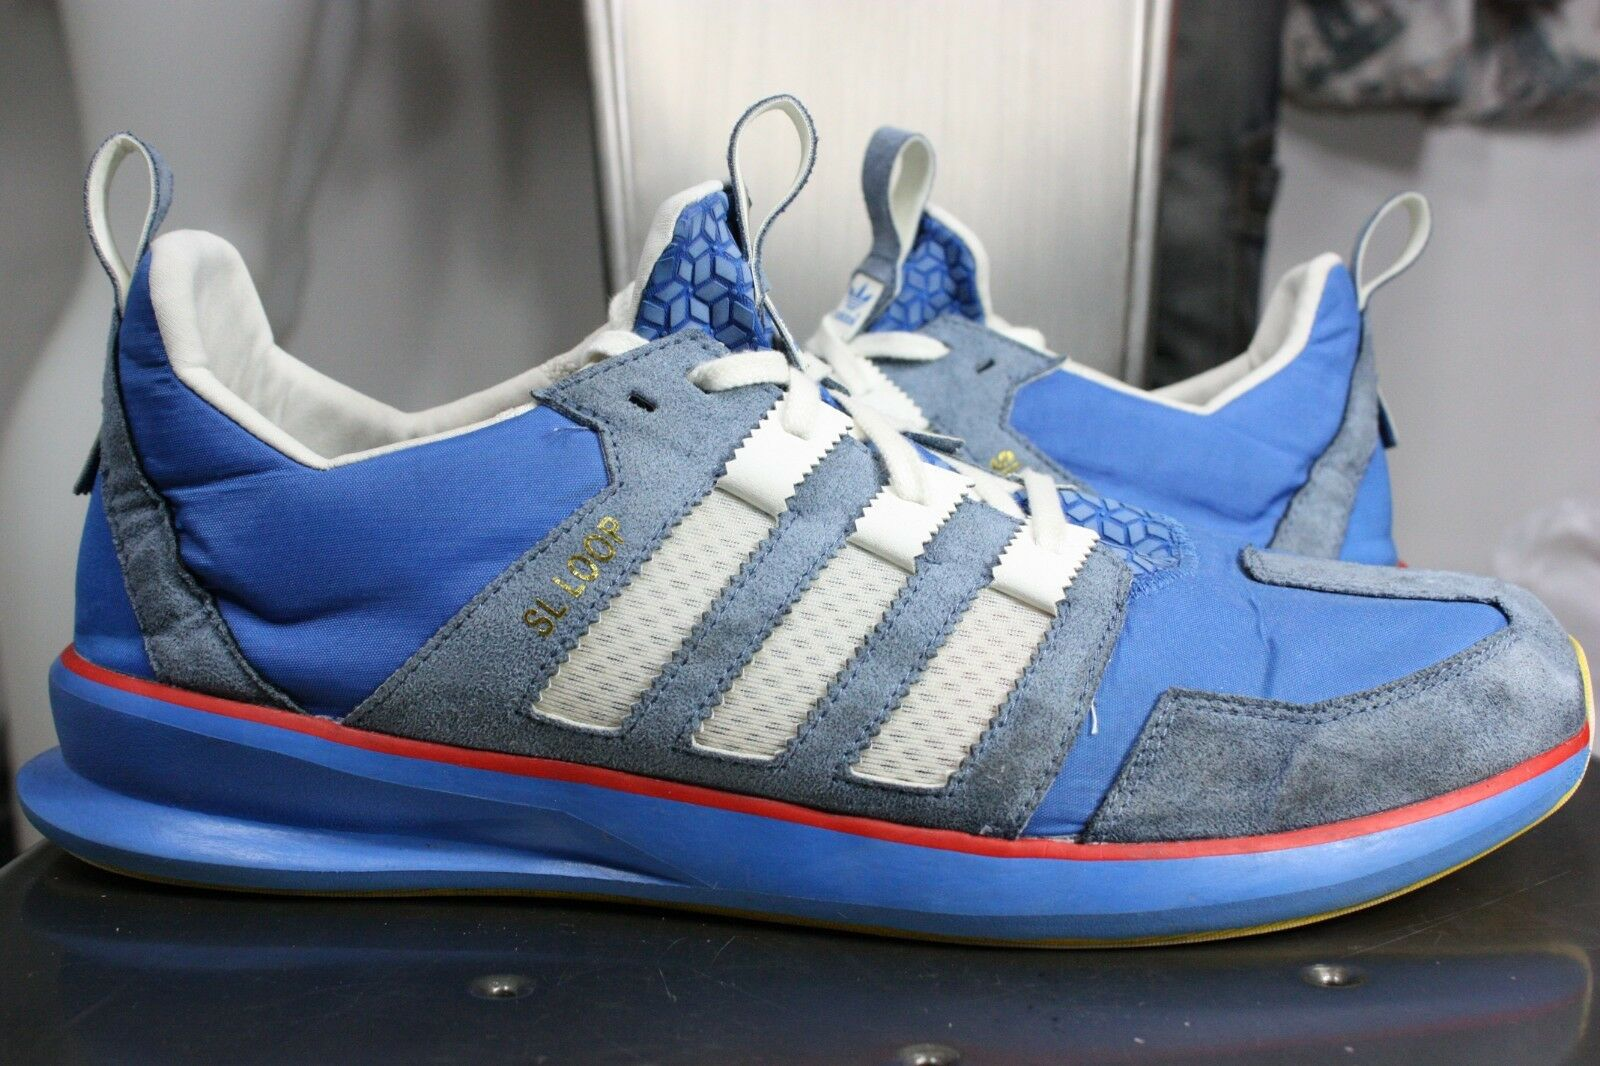 Adidas loop runner sl72 scarpe originali. 14 edizione limitata s85316 originali. scarpe a56532